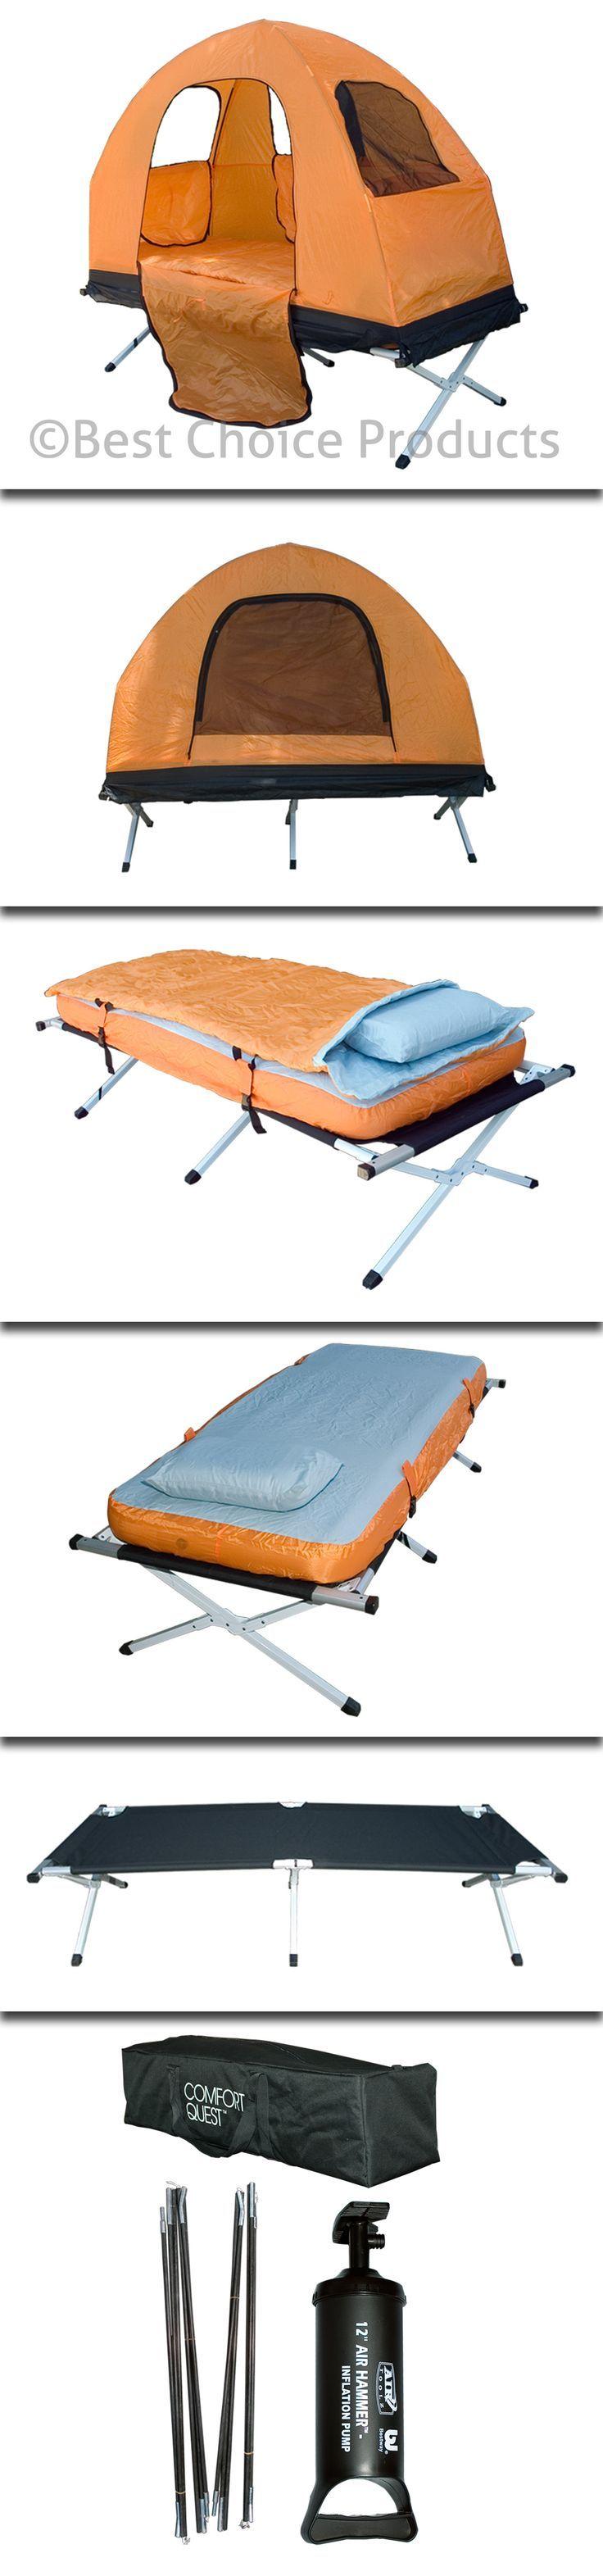 Best 25 Camping beds ideas on Pinterest